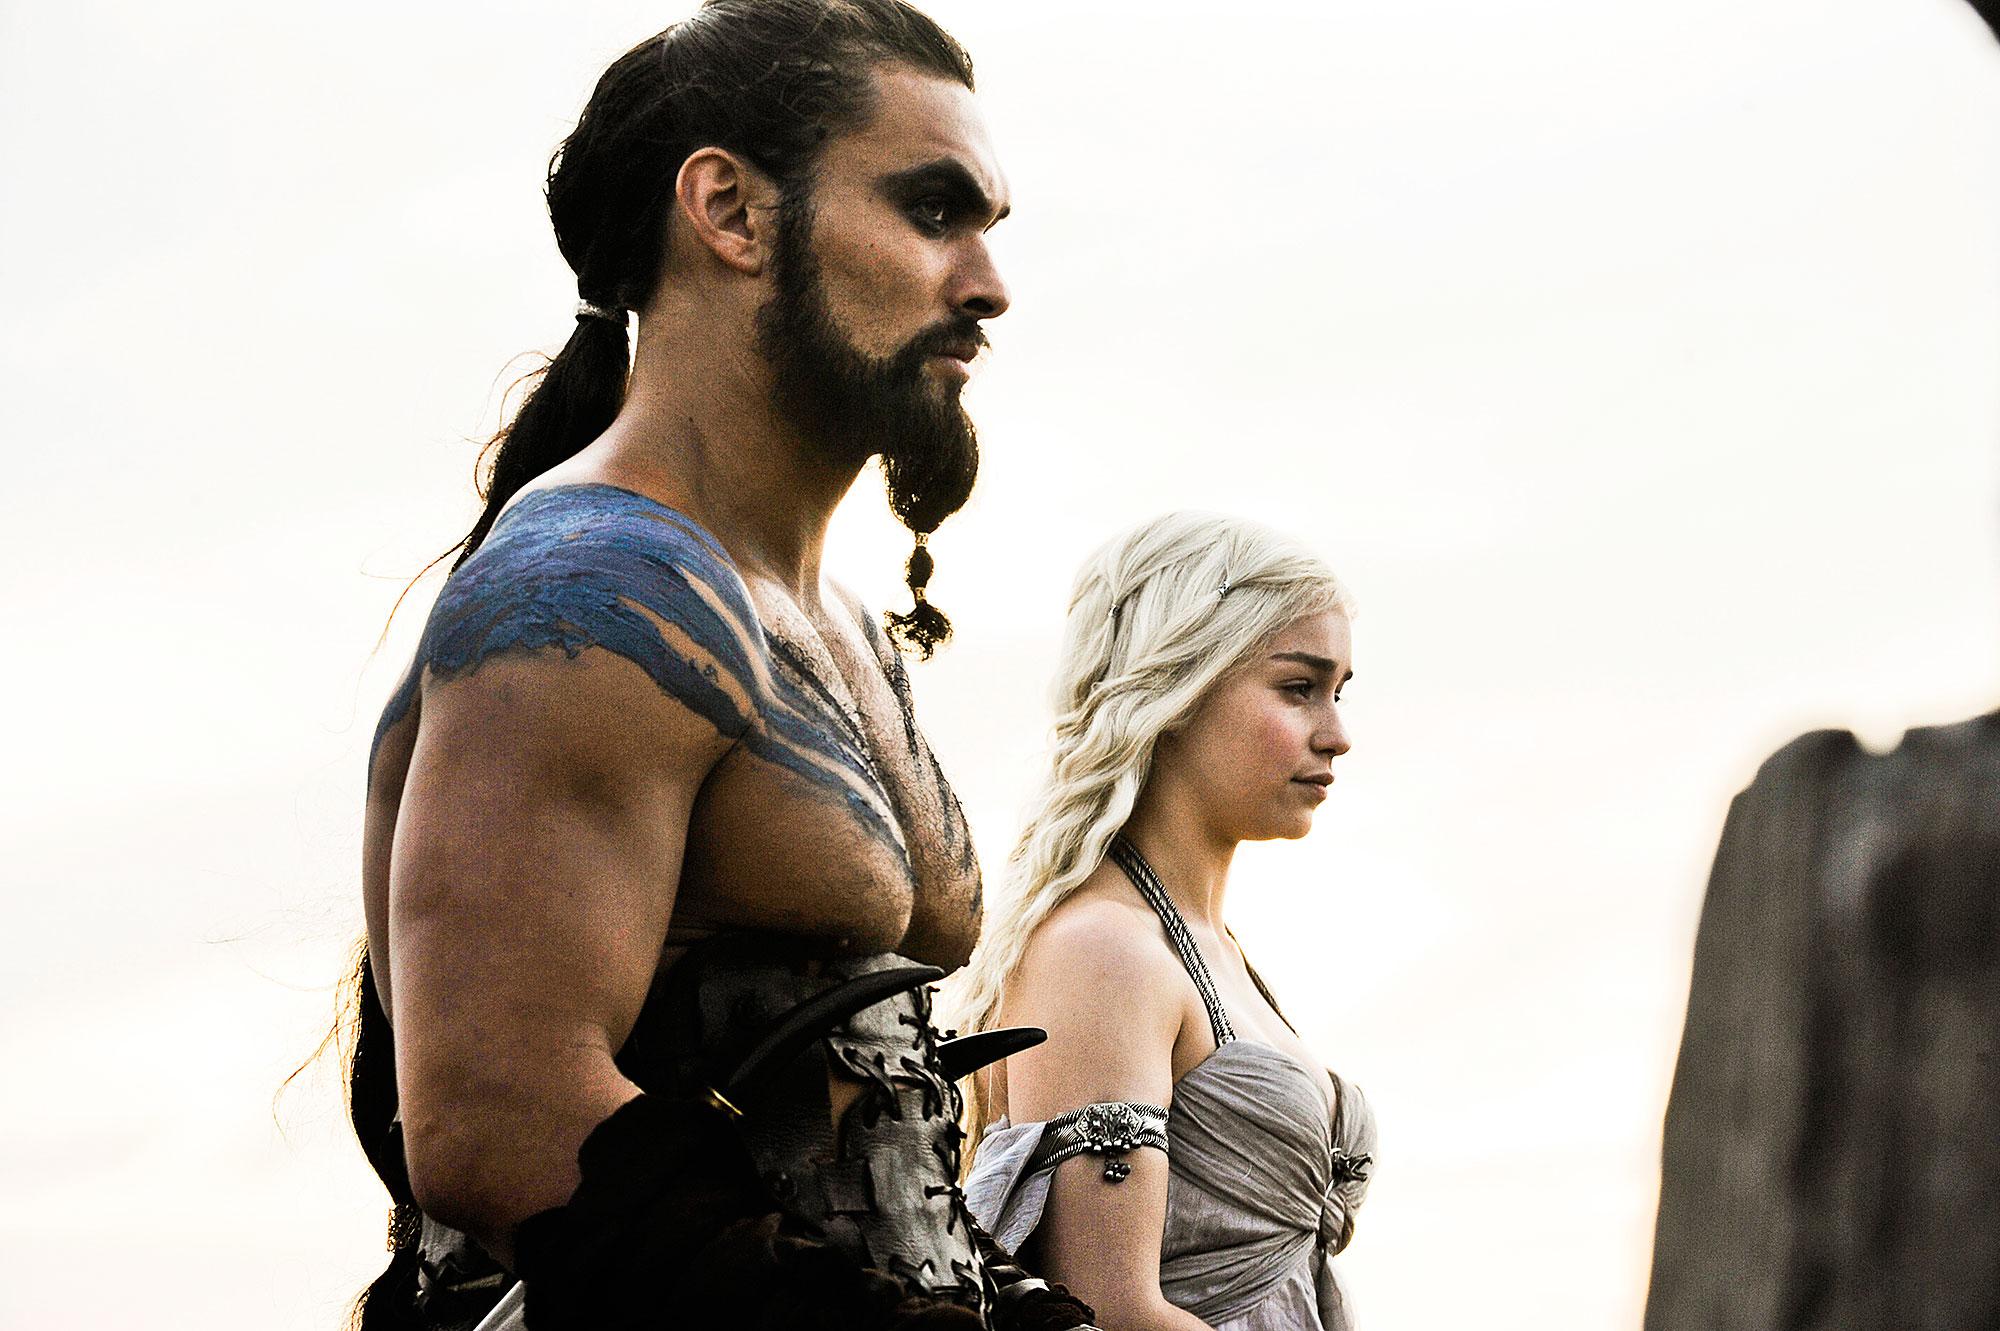 Emilia Clarke Game of Thrones Death Jason Momoa Reacts - Jason Momoa as Khal Drogo and Emilia Clarke as Daenerys Targaryen in 'Game of Thrones.